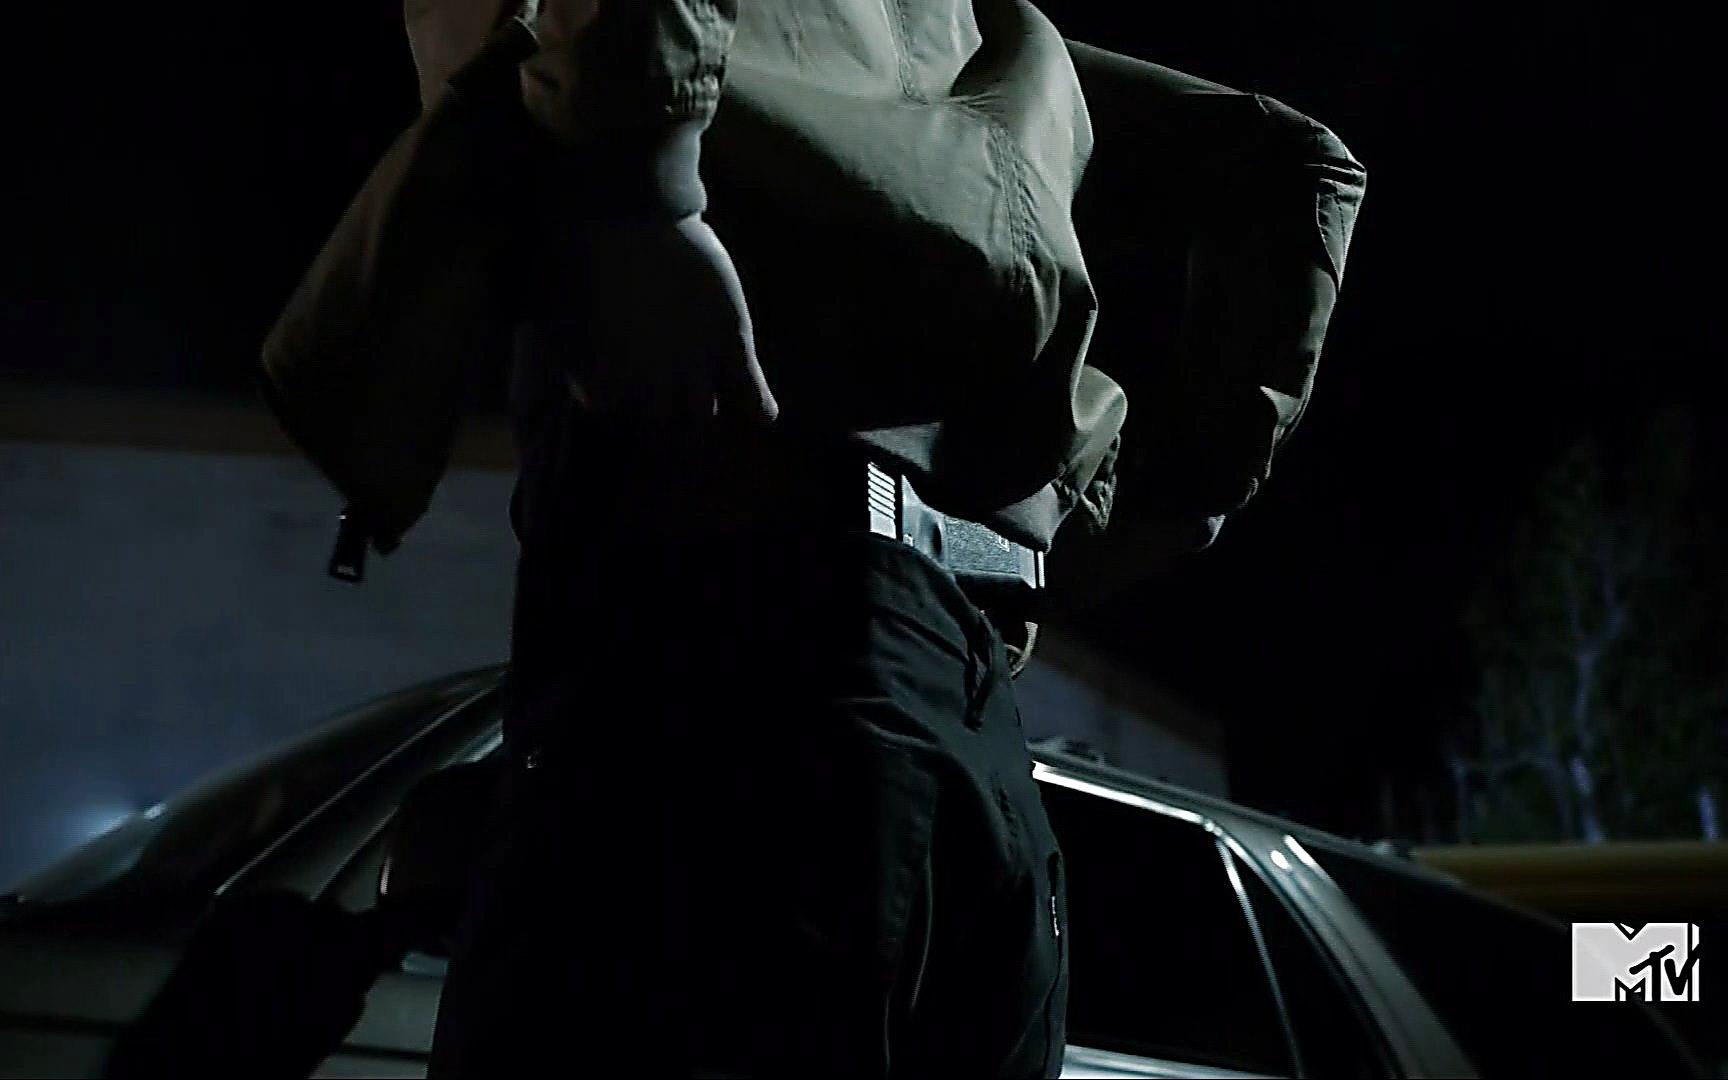 Ryan Kelley sexy shirtless scene August 4, 2015, 2am